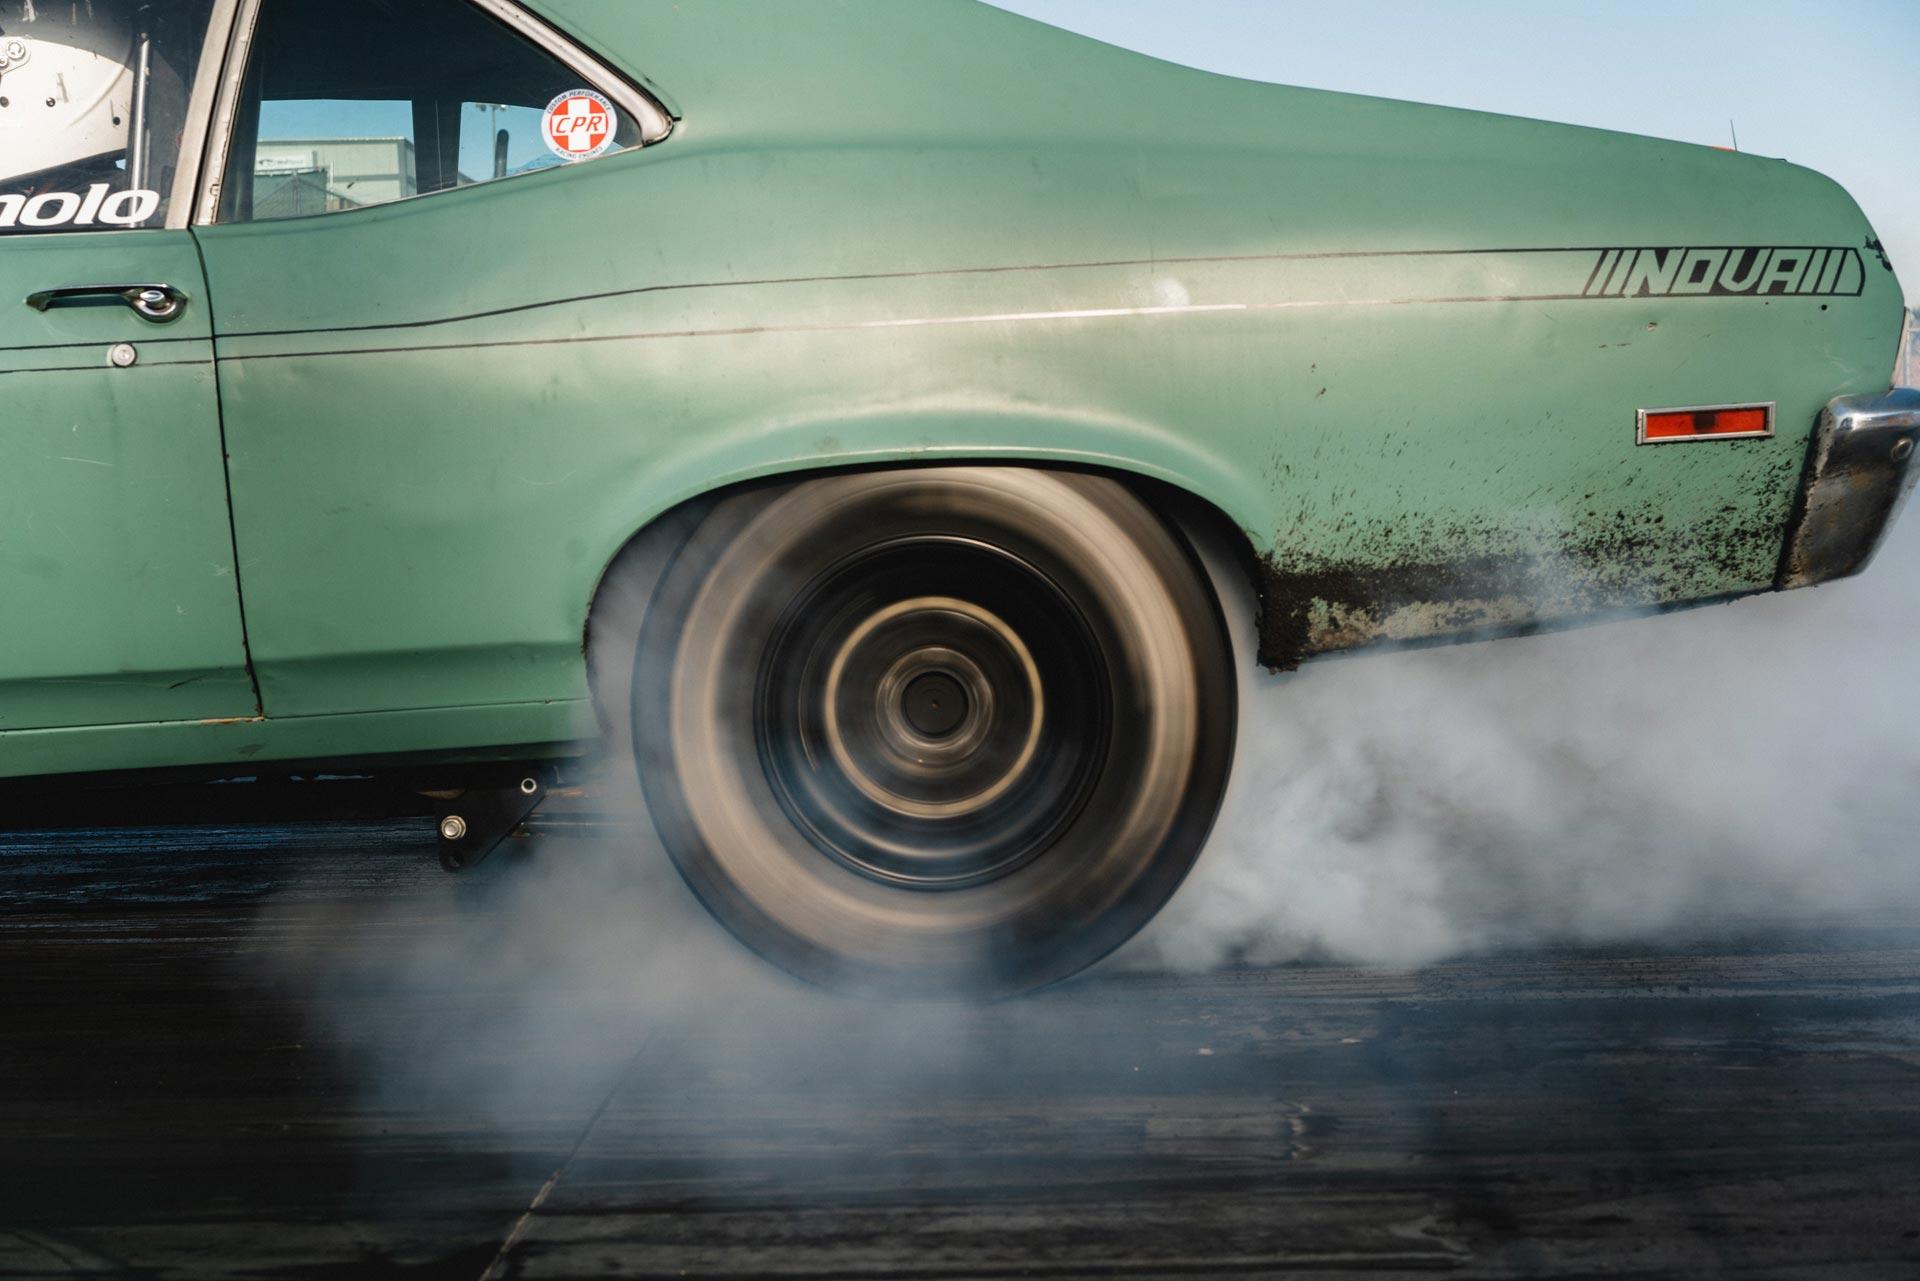 Bias Ply tire on a Chevy Nova drag car